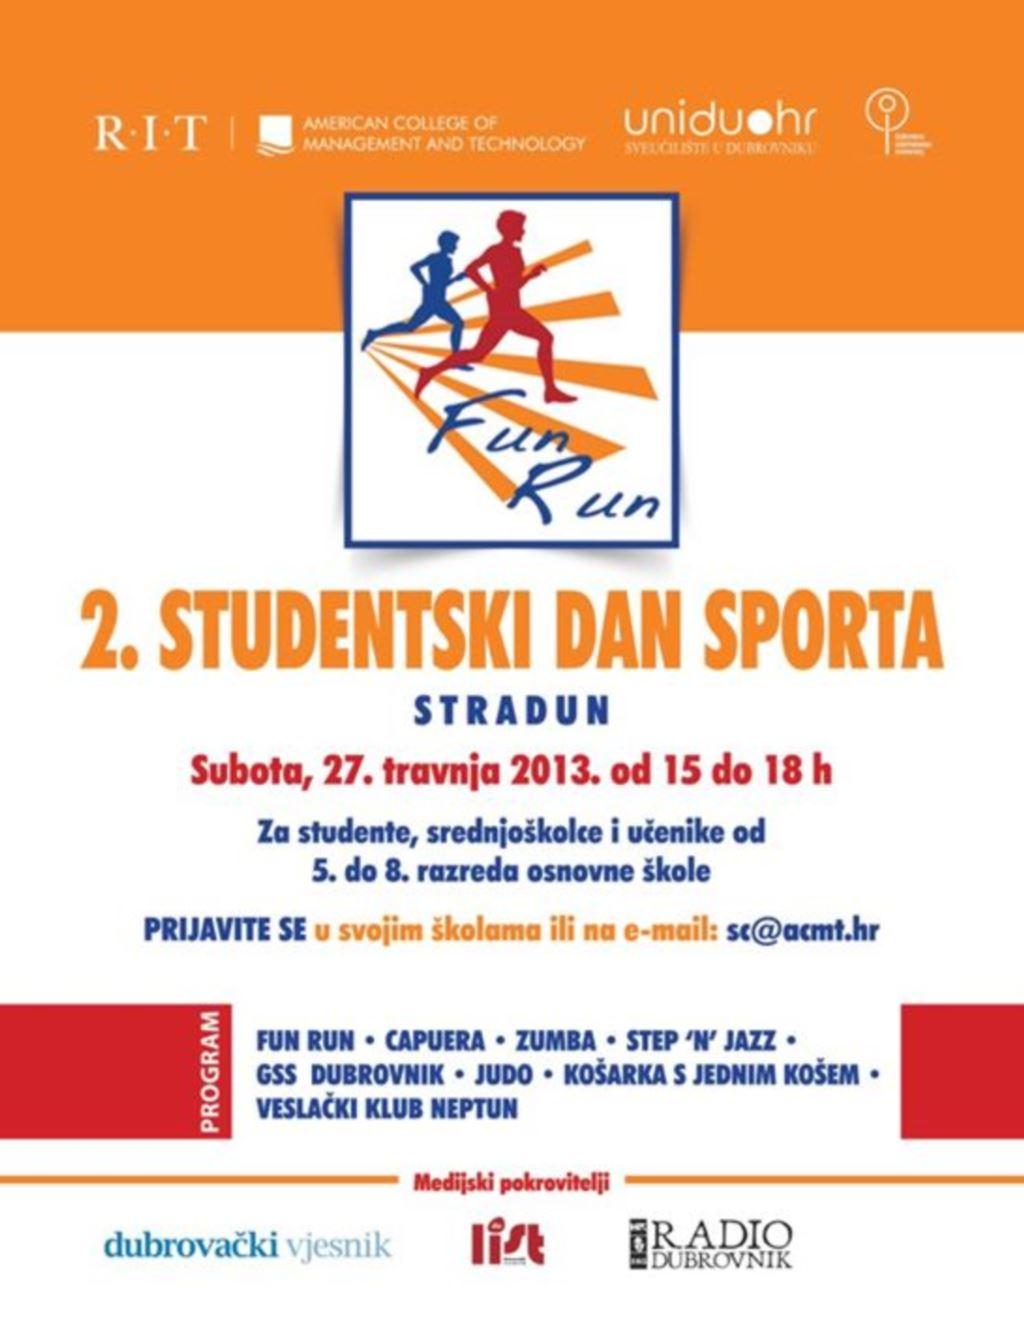 2. STUDENTSKI DAN SPORTA - RIT/ACMT FUN RUN